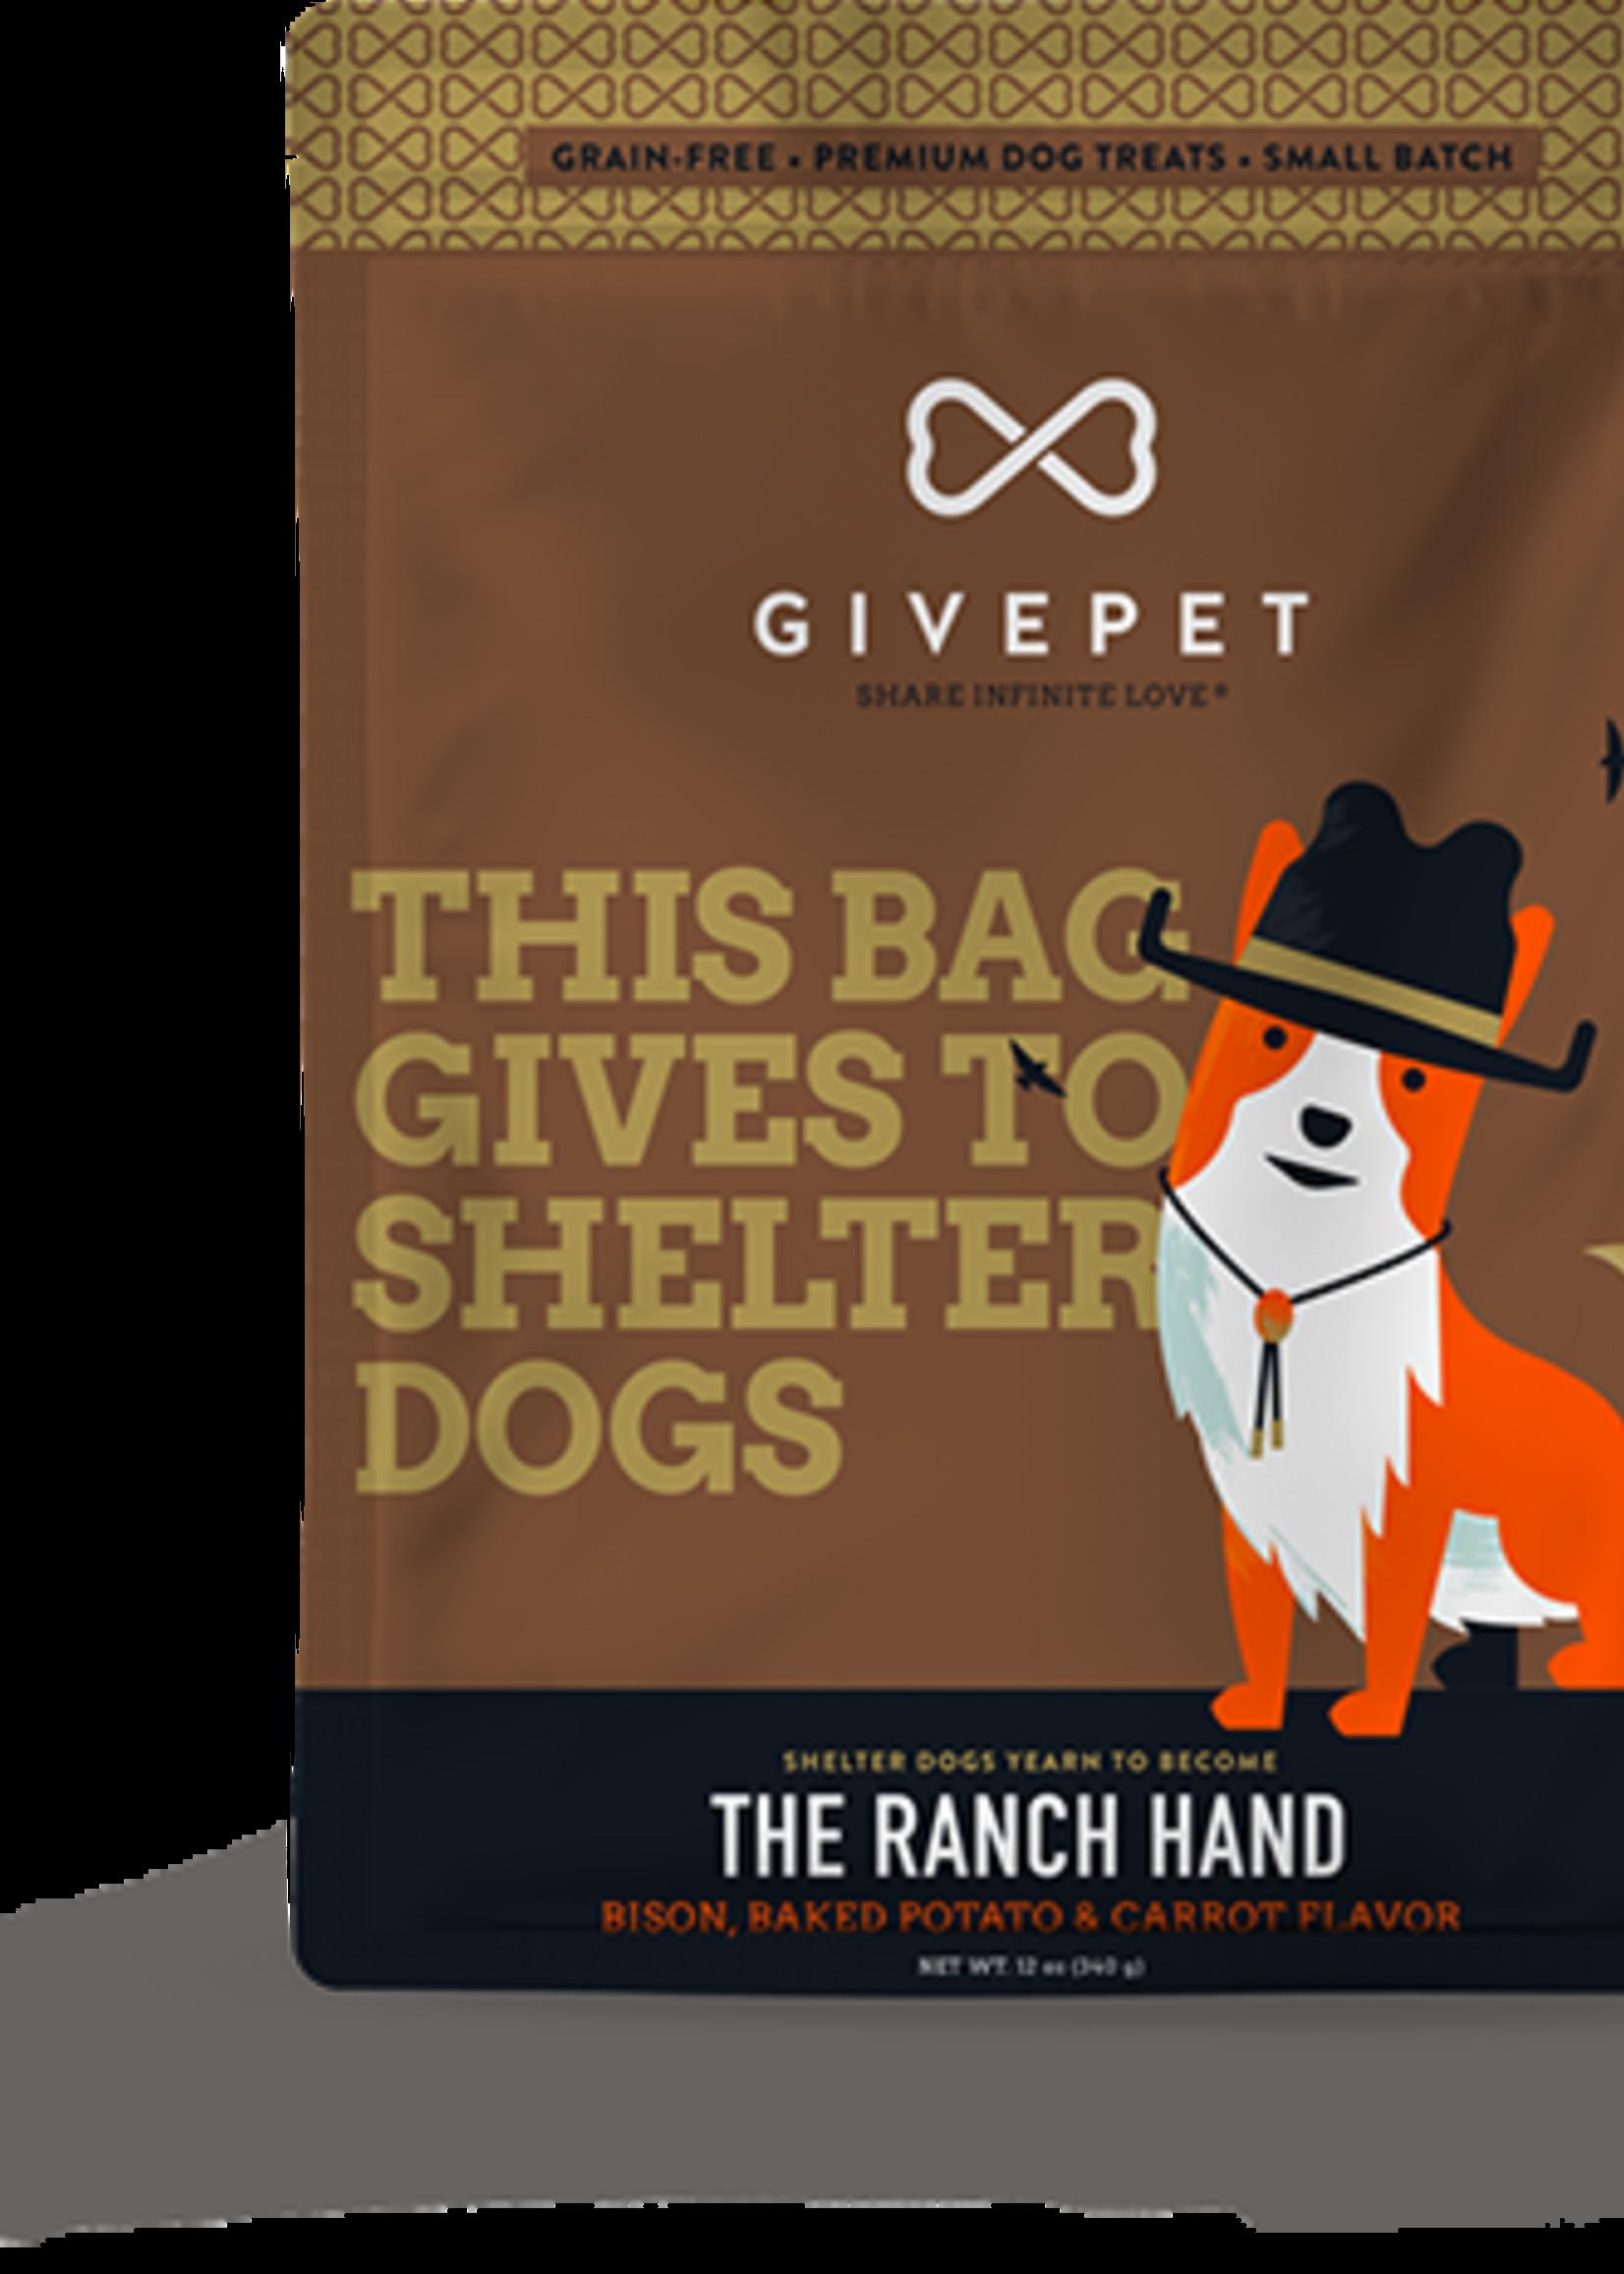 Givepet Givepet Ranch Hand 12 oz